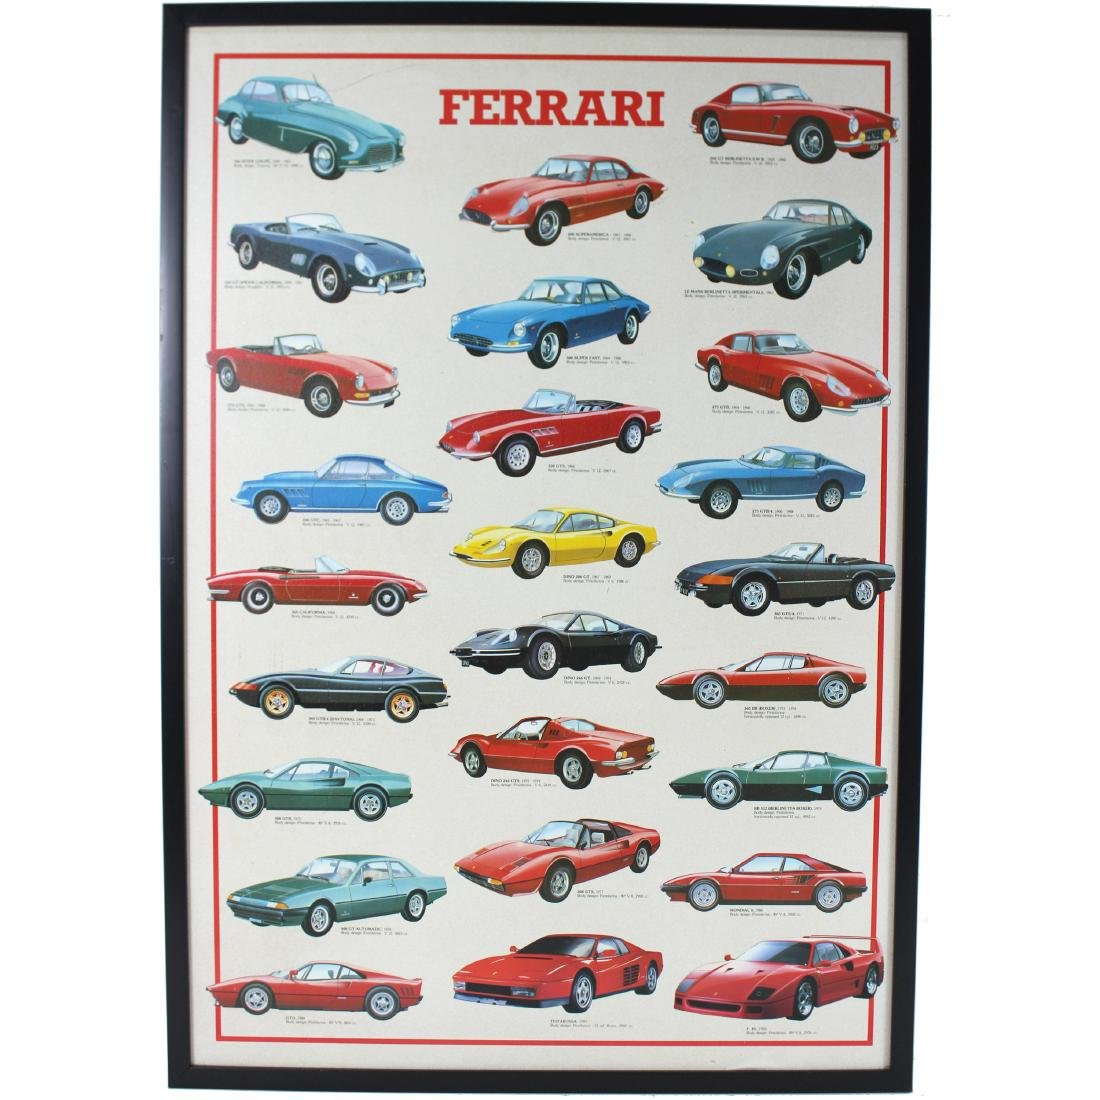 VINTAGE, CLASSIC FERRARI CAR POSTER ON BOARD